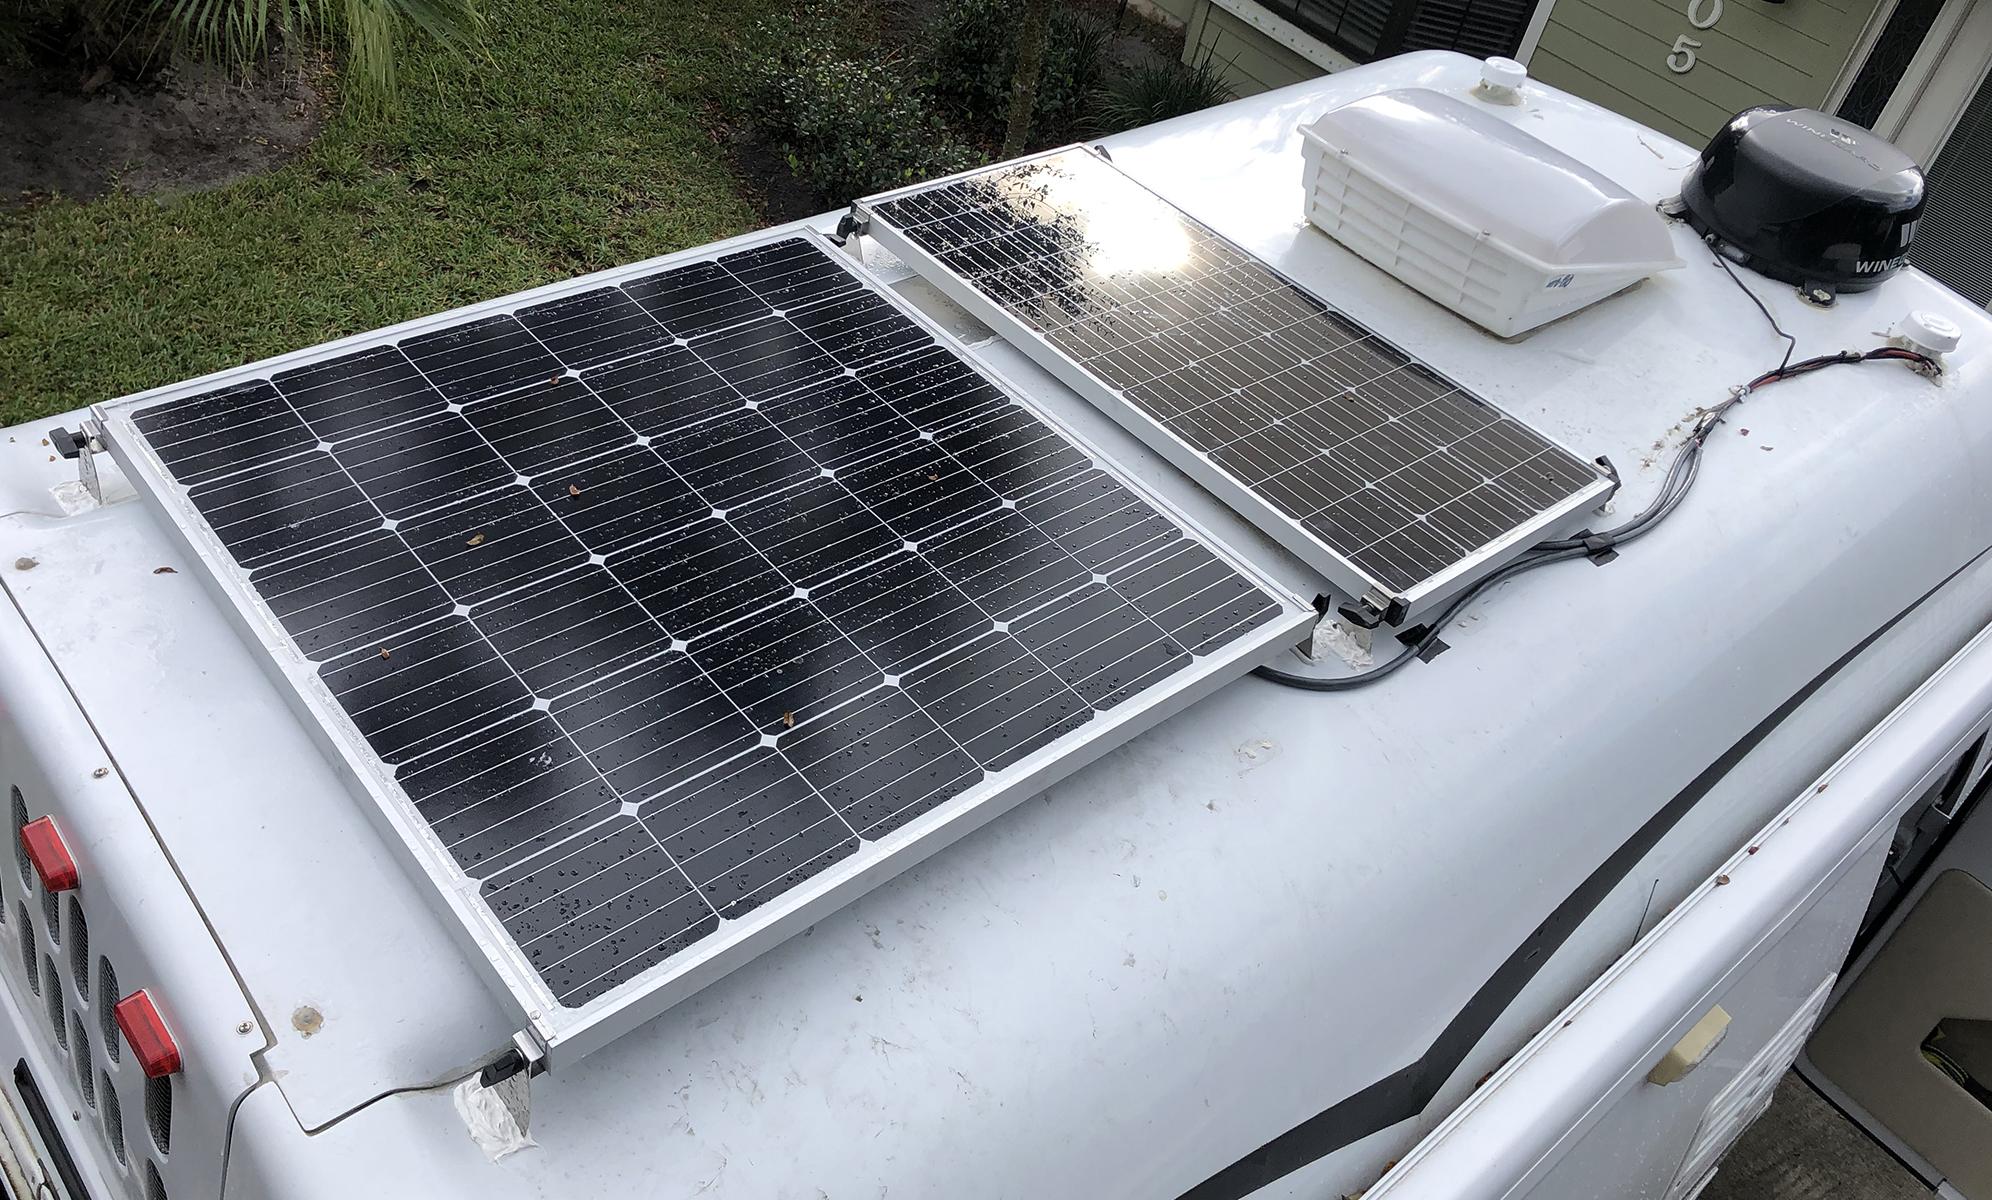 Solar Panels Off The Grid Camper Pleasure Way Van Boondocking